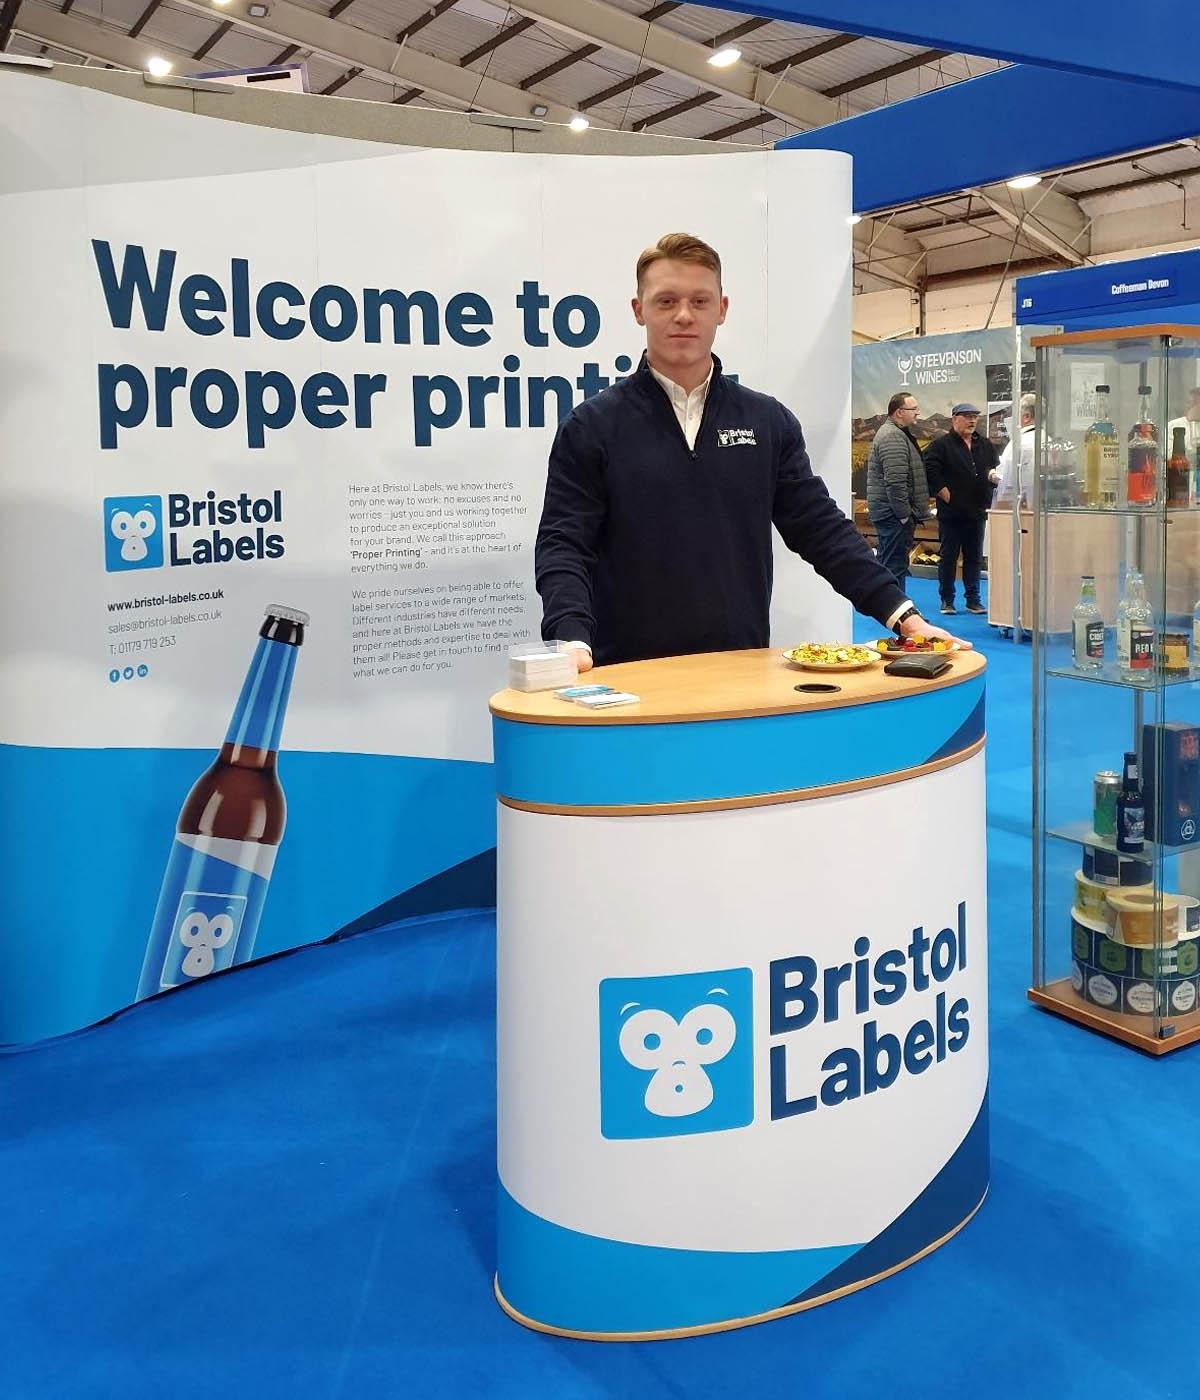 Bristol Labels tradeshow stand design